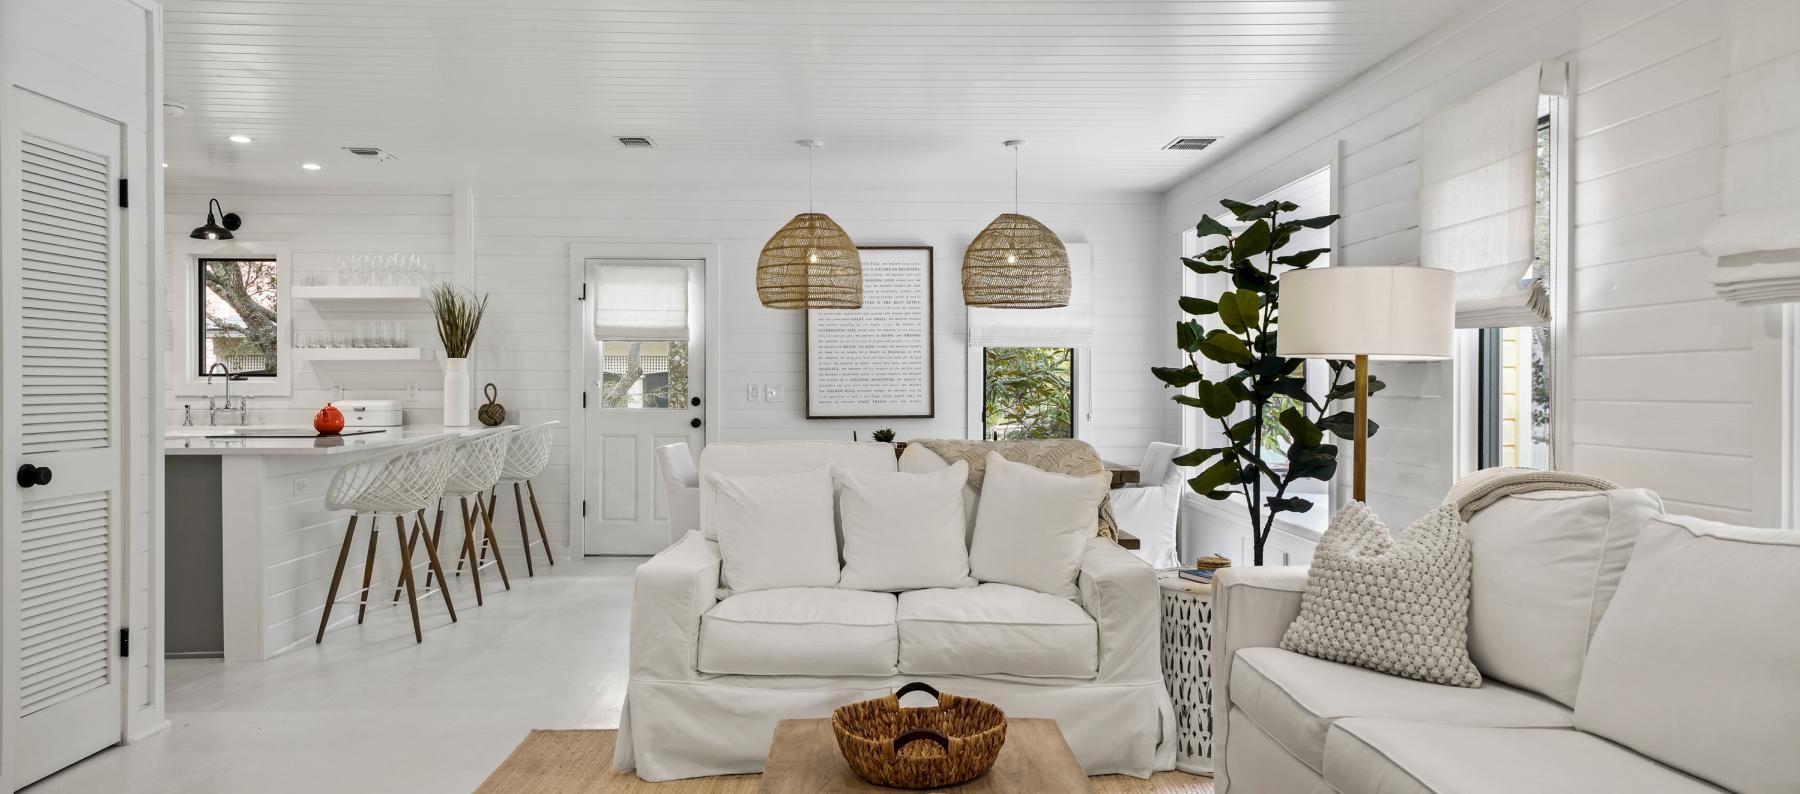 Seaside FL Almost Heaven Interior Living Area